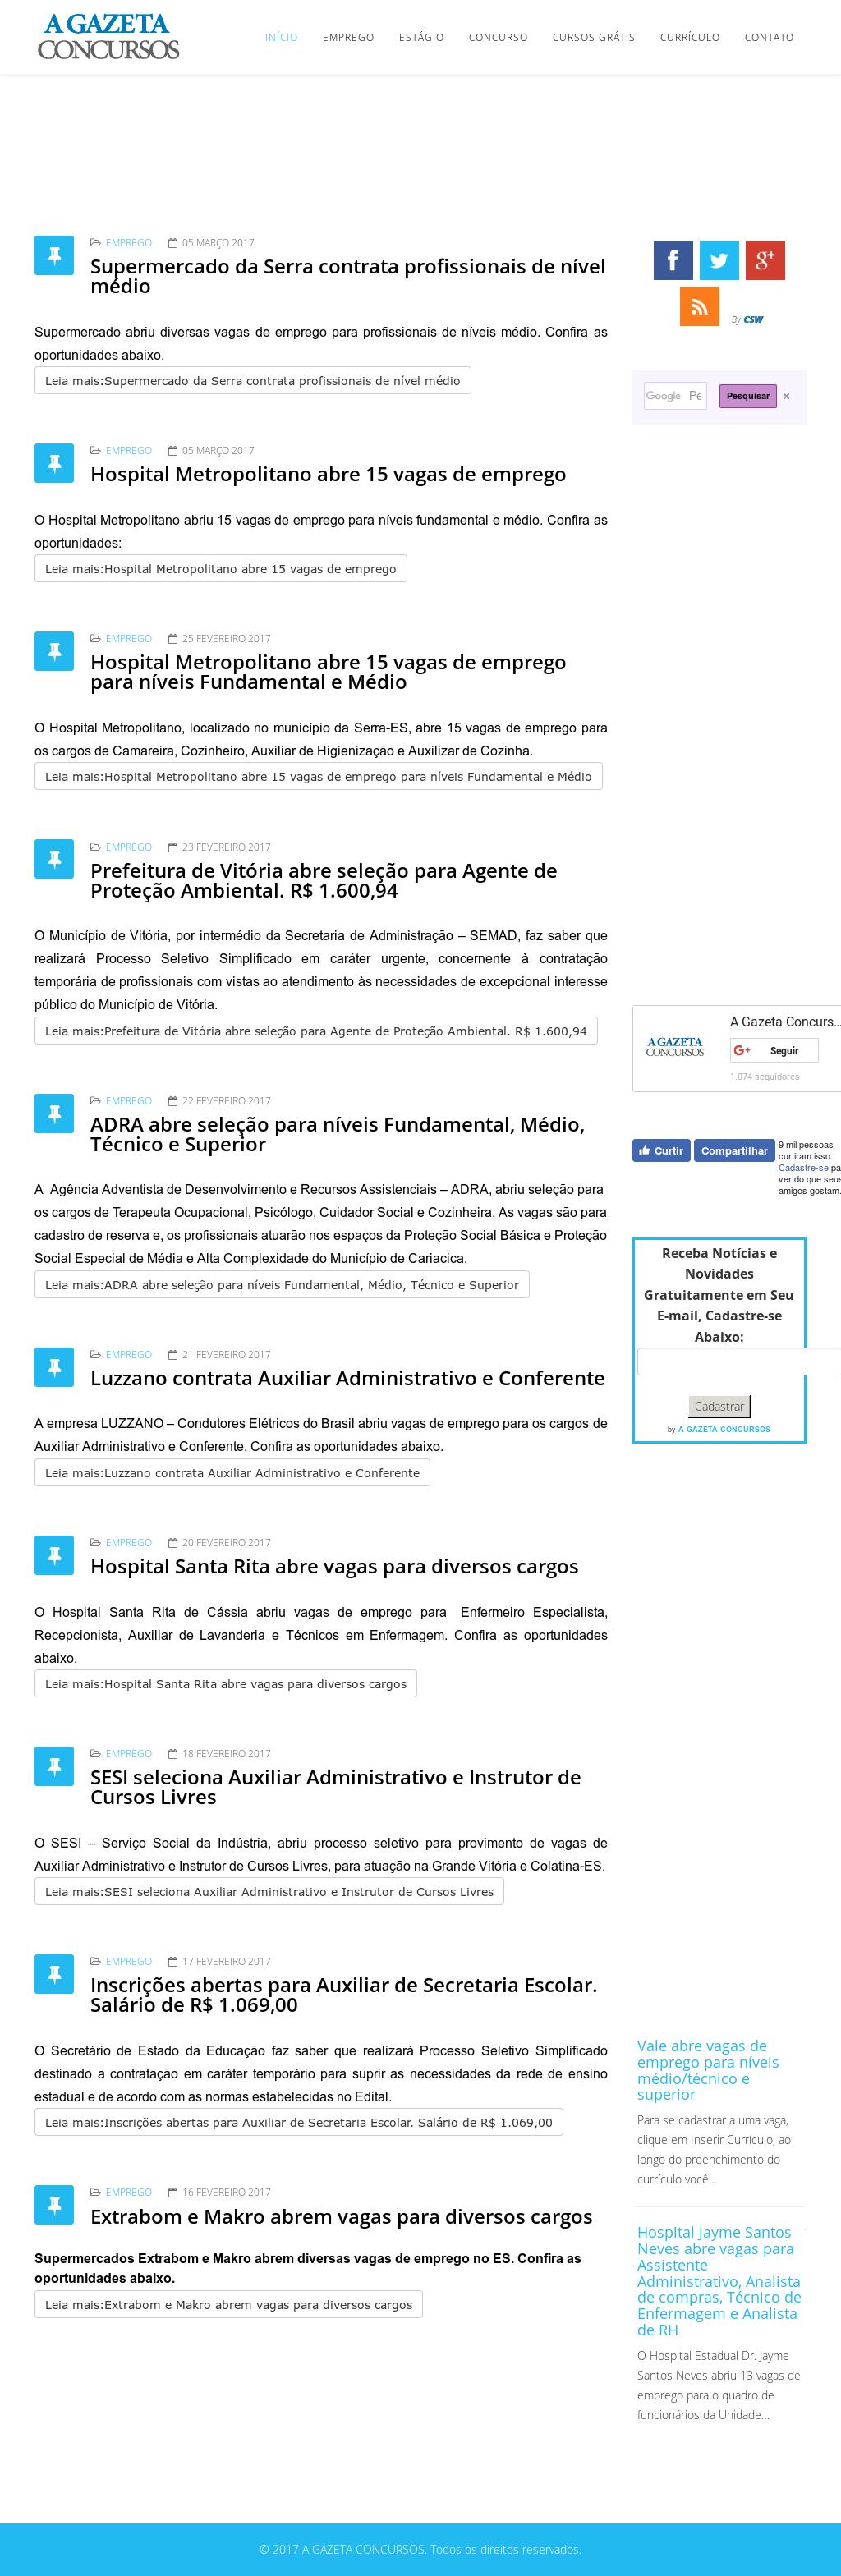 A Gazeta Concursos Competitors 6c4ffdb661b47